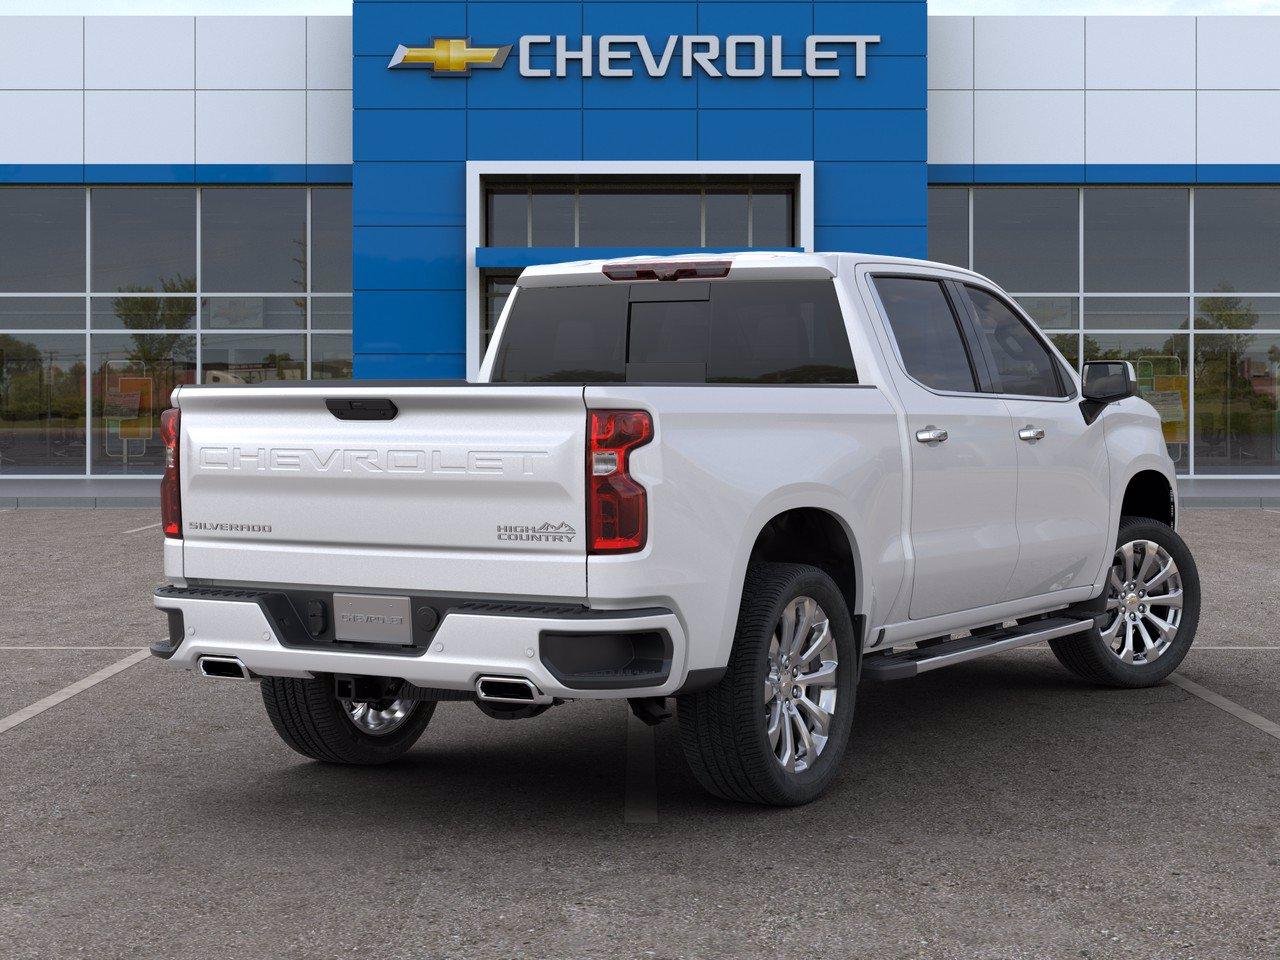 2020 Chevrolet Silverado 1500 Crew Cab 4x4, Pickup #C201483 - photo 2